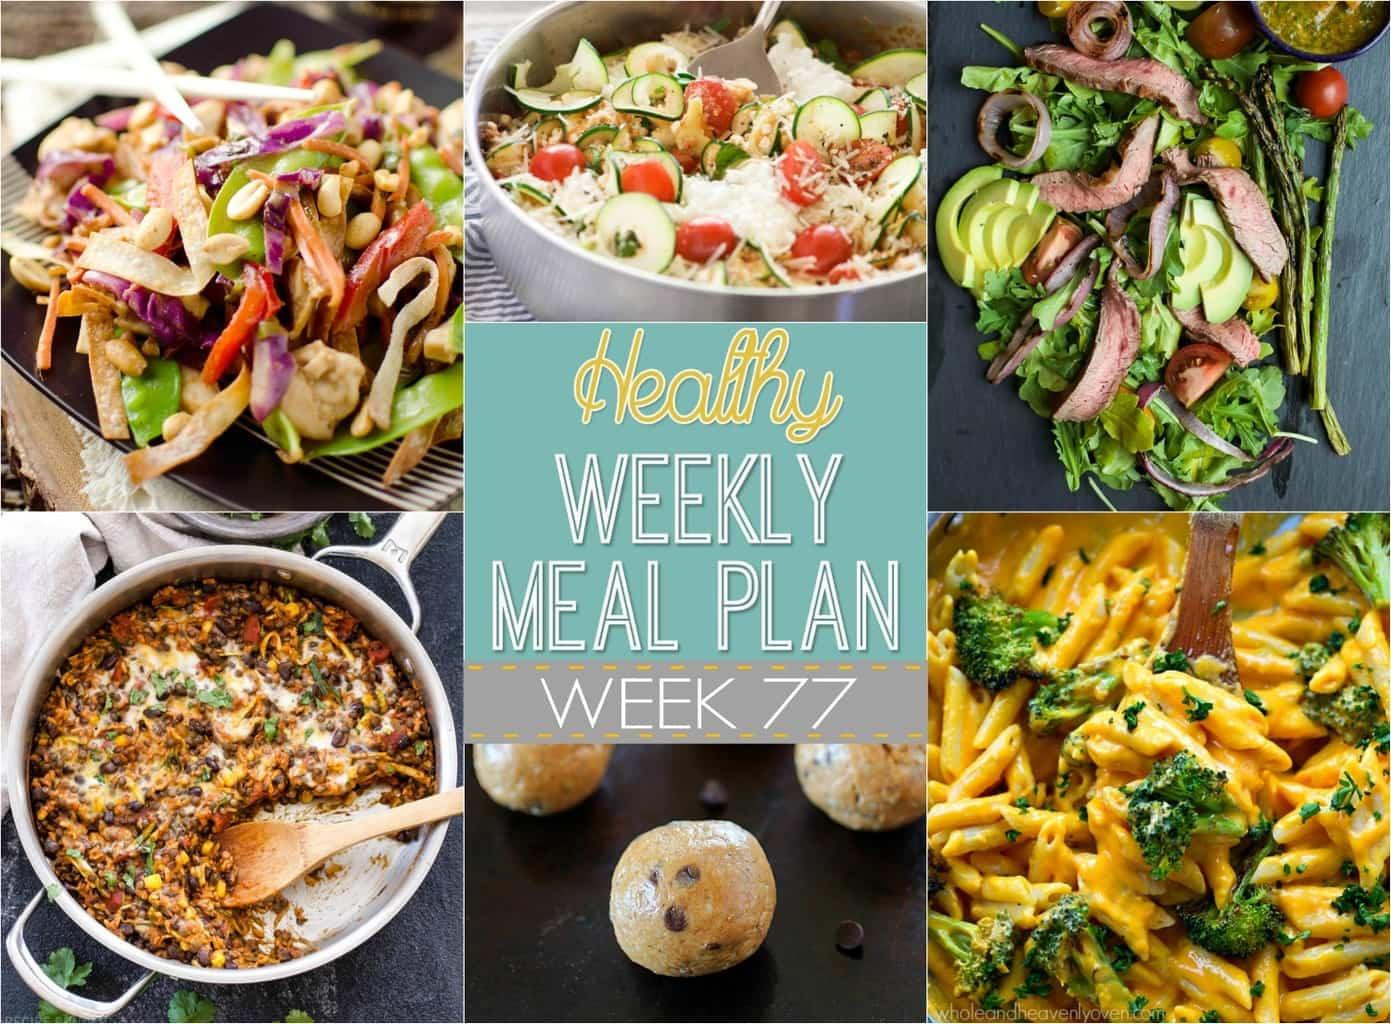 Healthy Breakfast Sides  Healthy Weekly Meal Plan 77 Yummy Healthy Easy